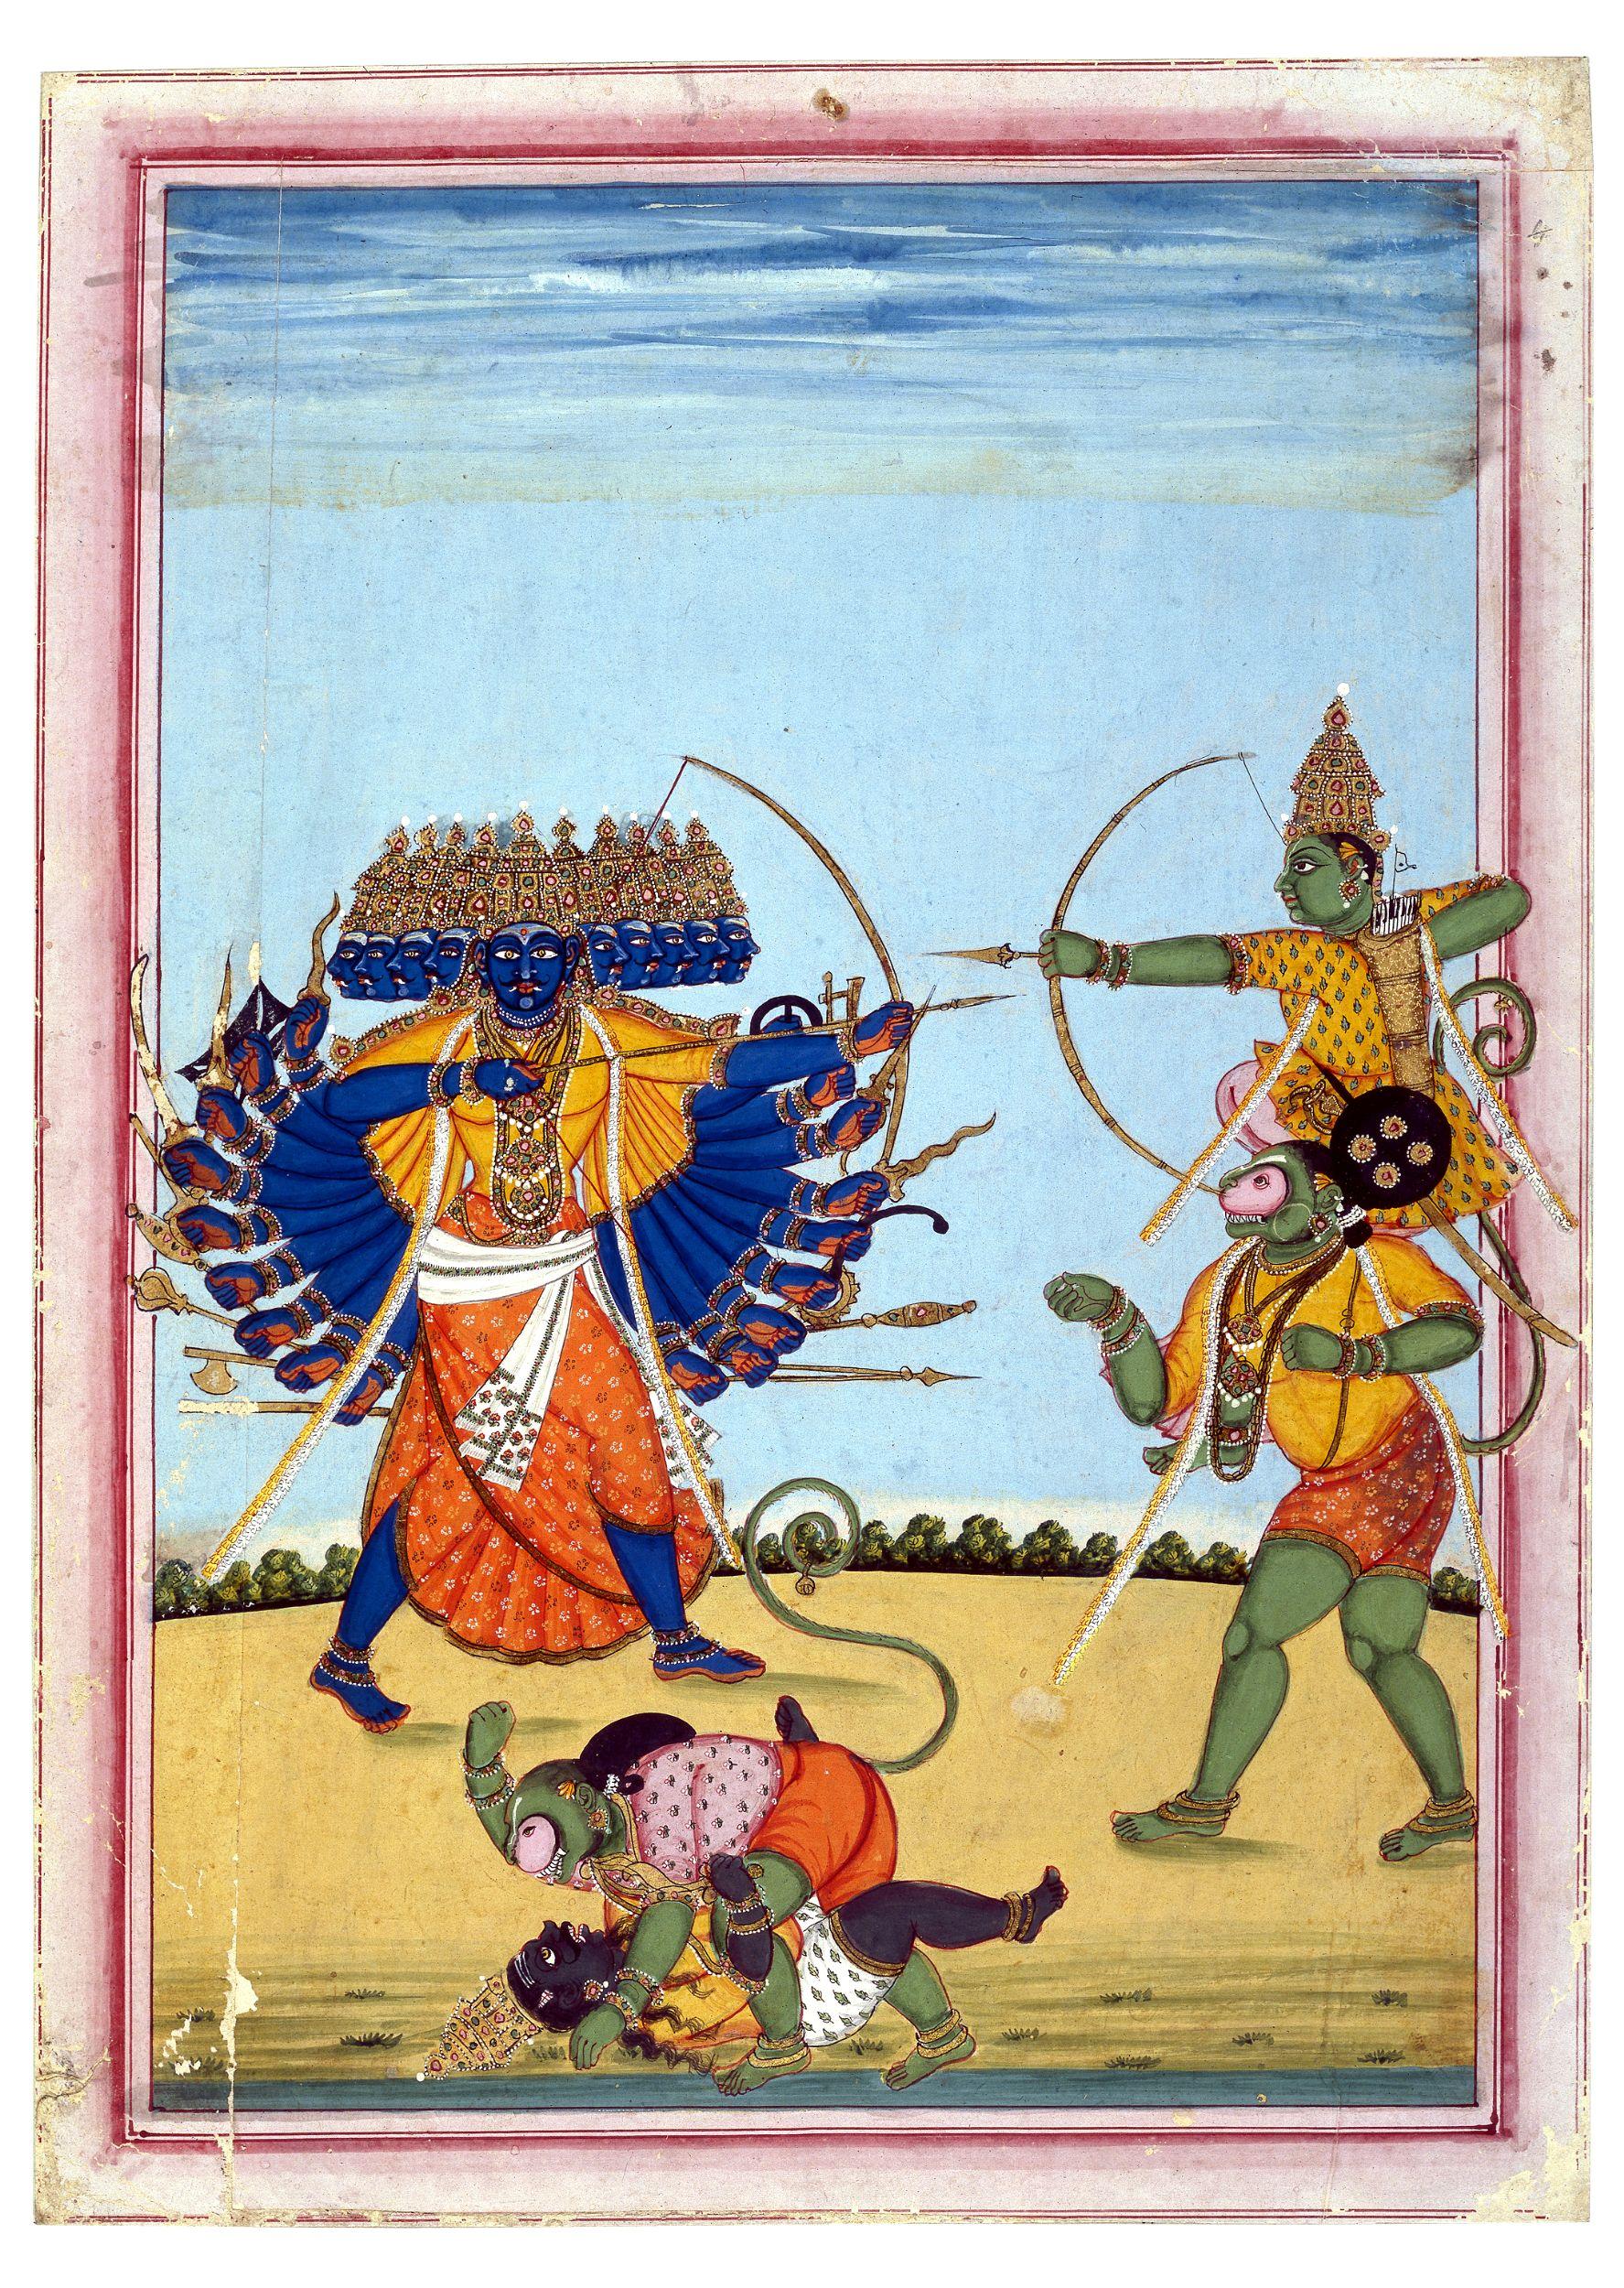 Tamil mythology